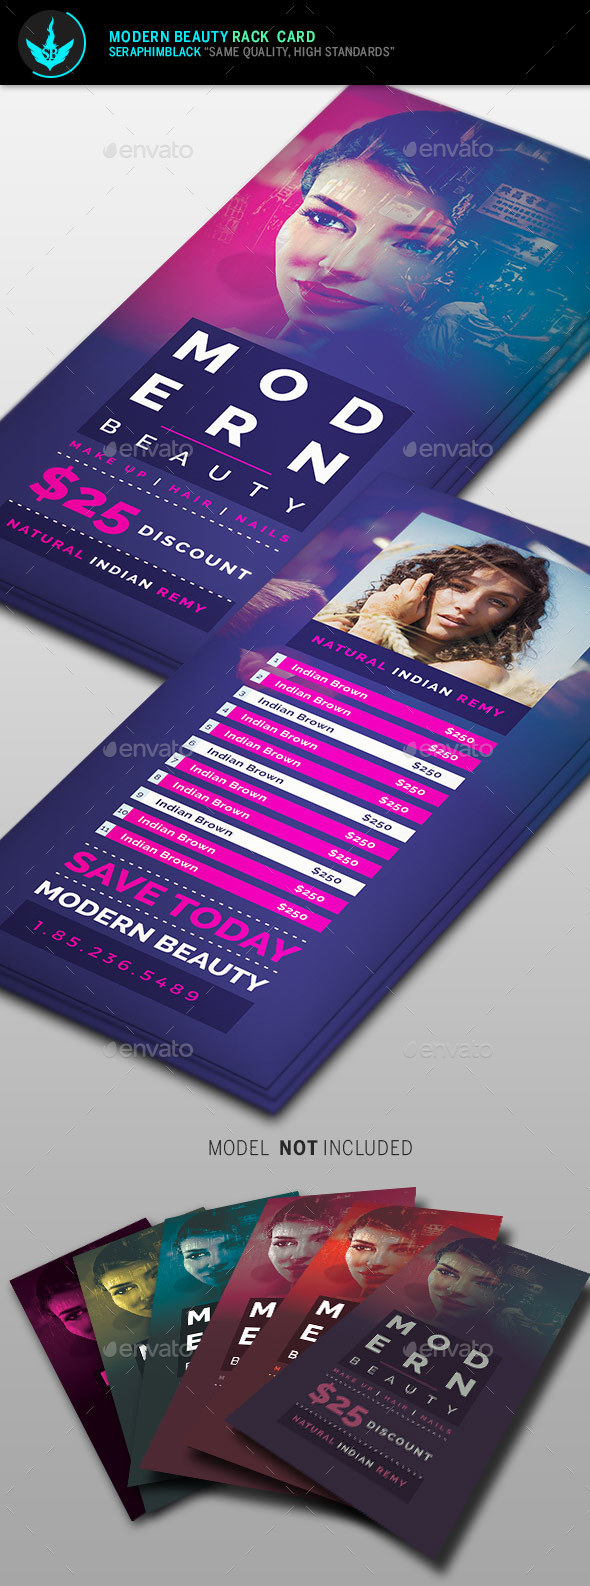 Modern Beauty Rack Card Template - Commerce Flyers